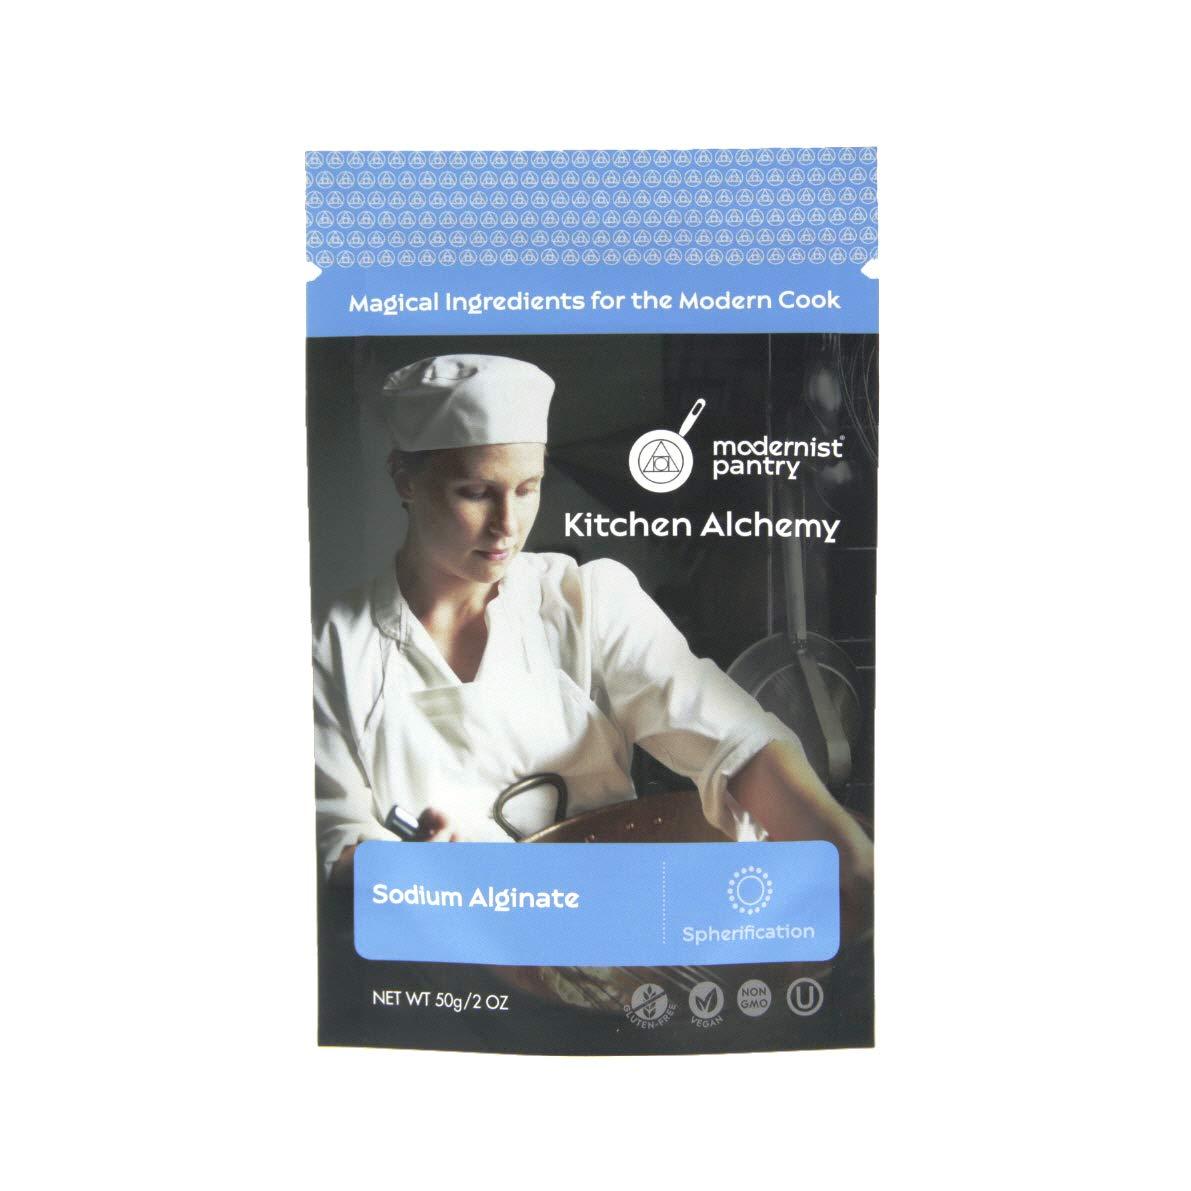 Pure Sodium Alginate (Molecular Gastronomy) ⊘ Non-GMO ☮ Vegan ✡ OU Kosher Certified - 50g/2oz